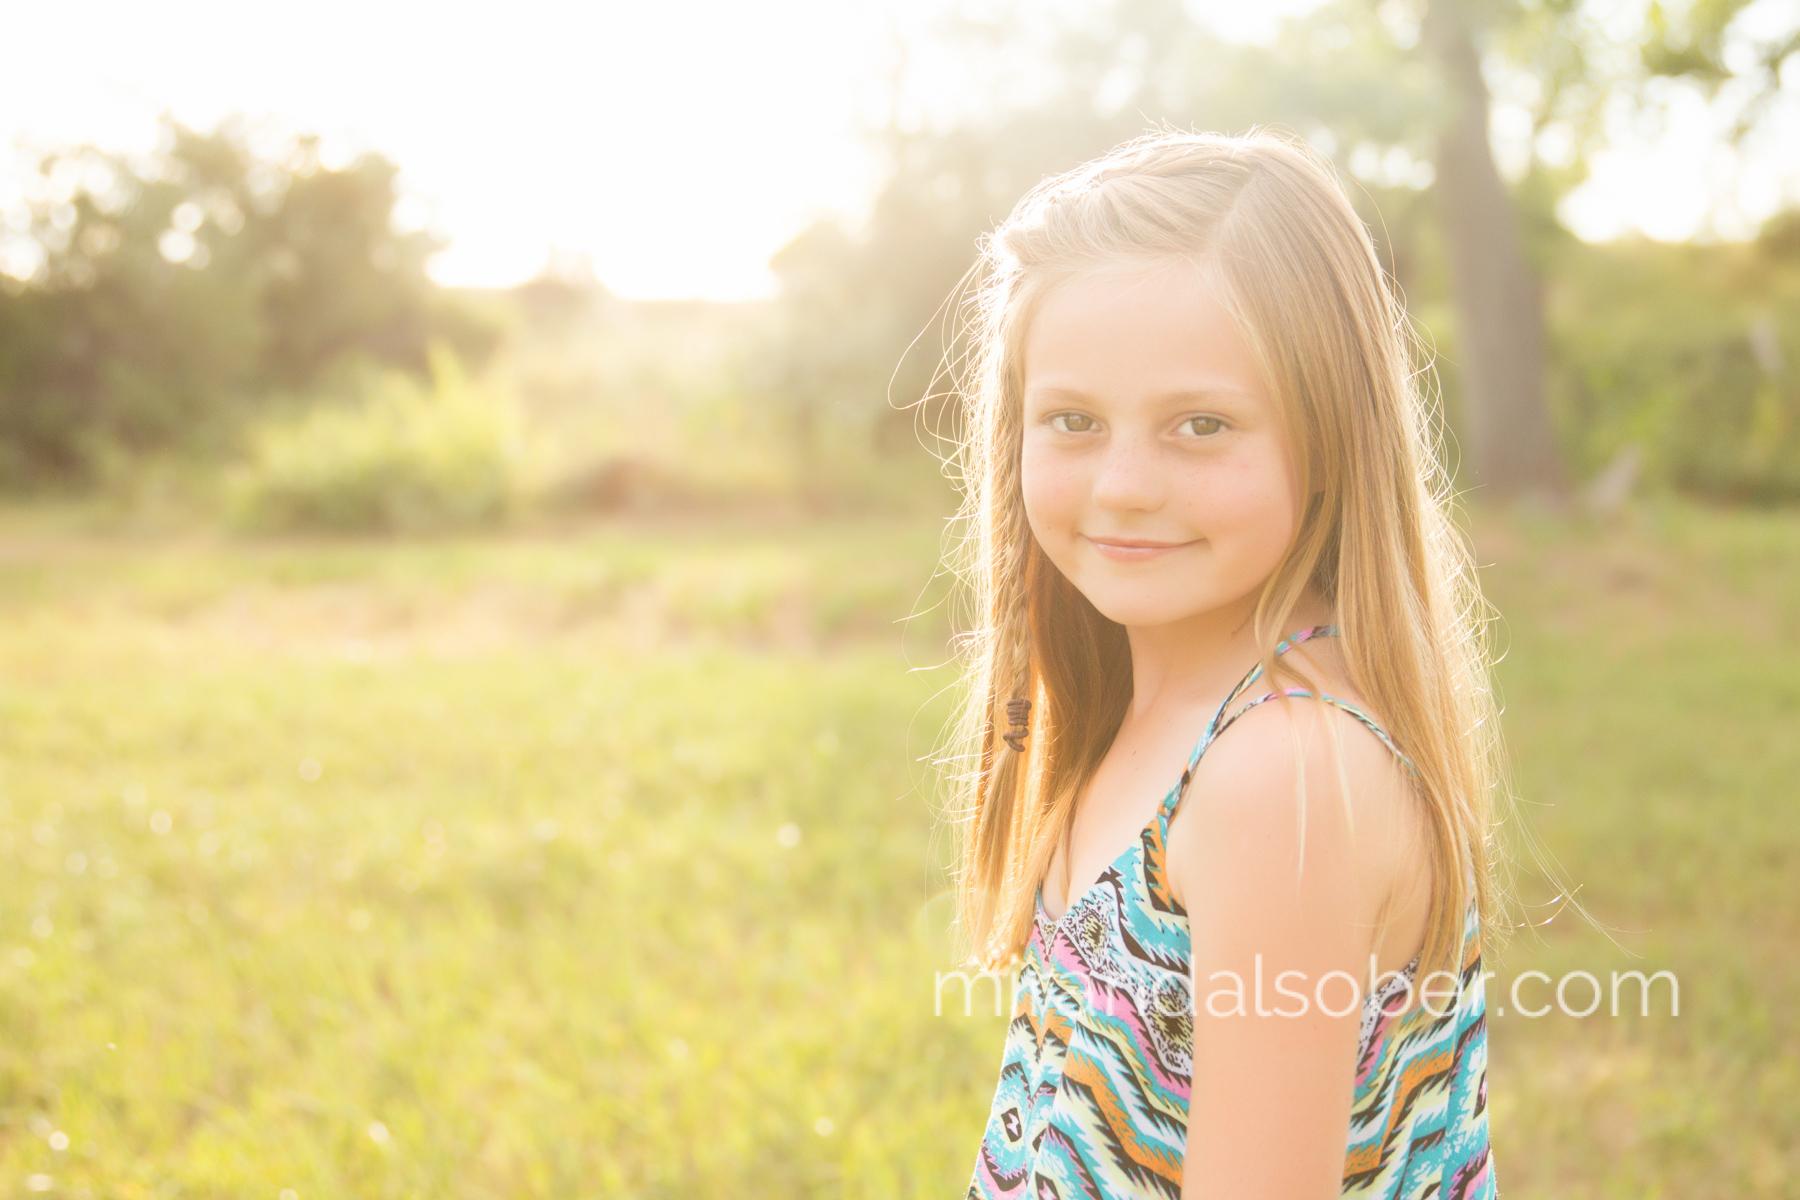 family photography, Miranda L. Sober, Fort Collins photographer